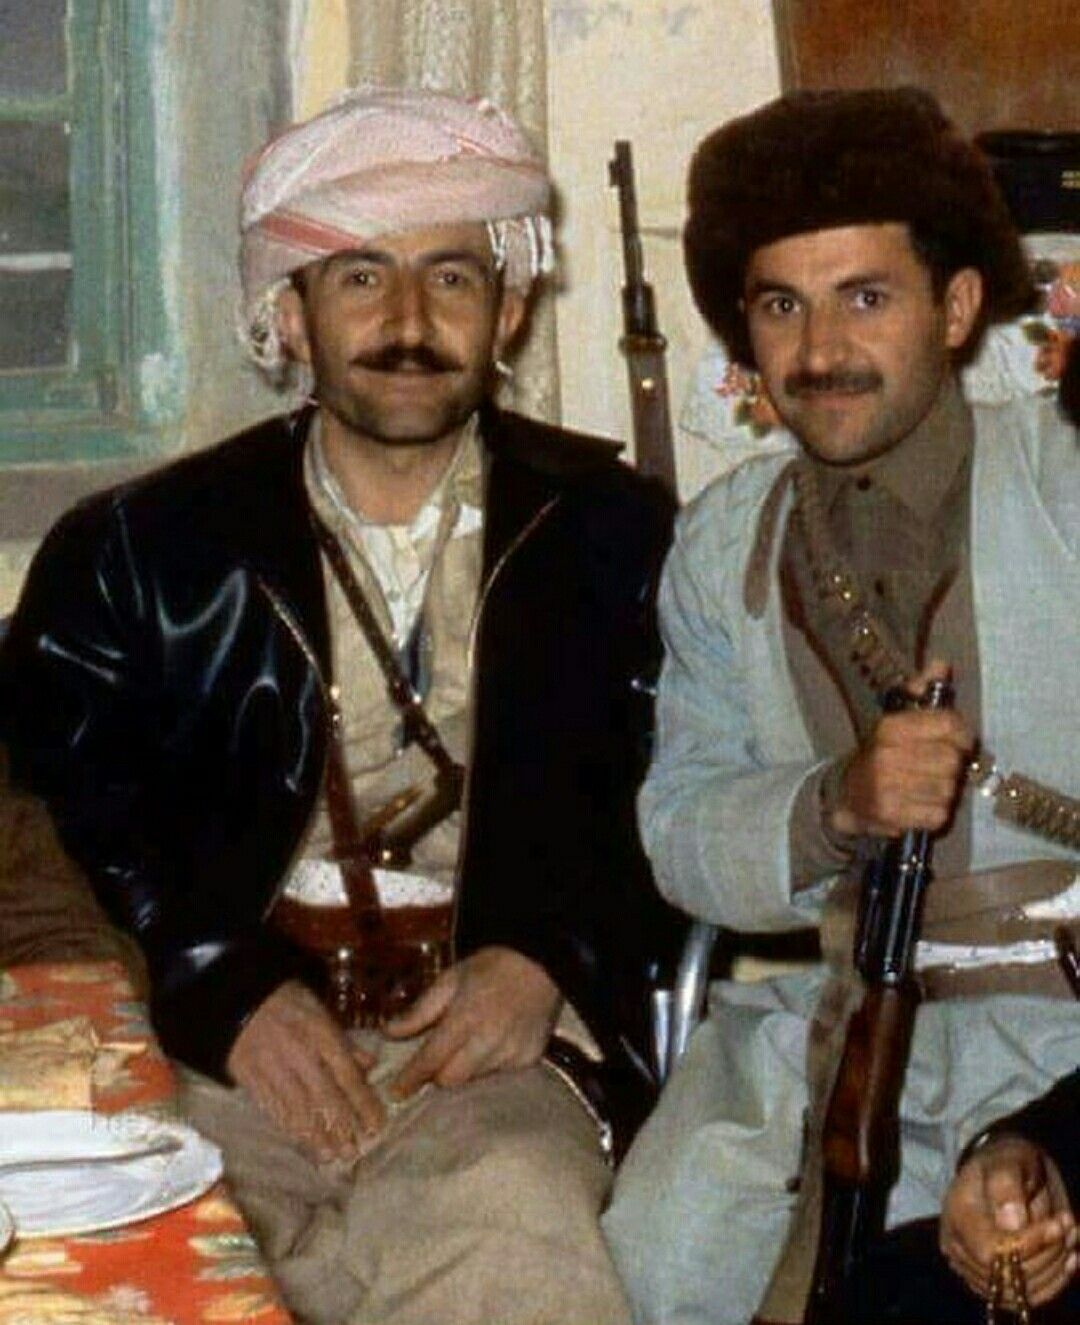 Pin By Yasa Hasanpour On History Of Kurdestan: President Of Kurdistan Jalal Talabani 😔 3.10.2017 He Lost